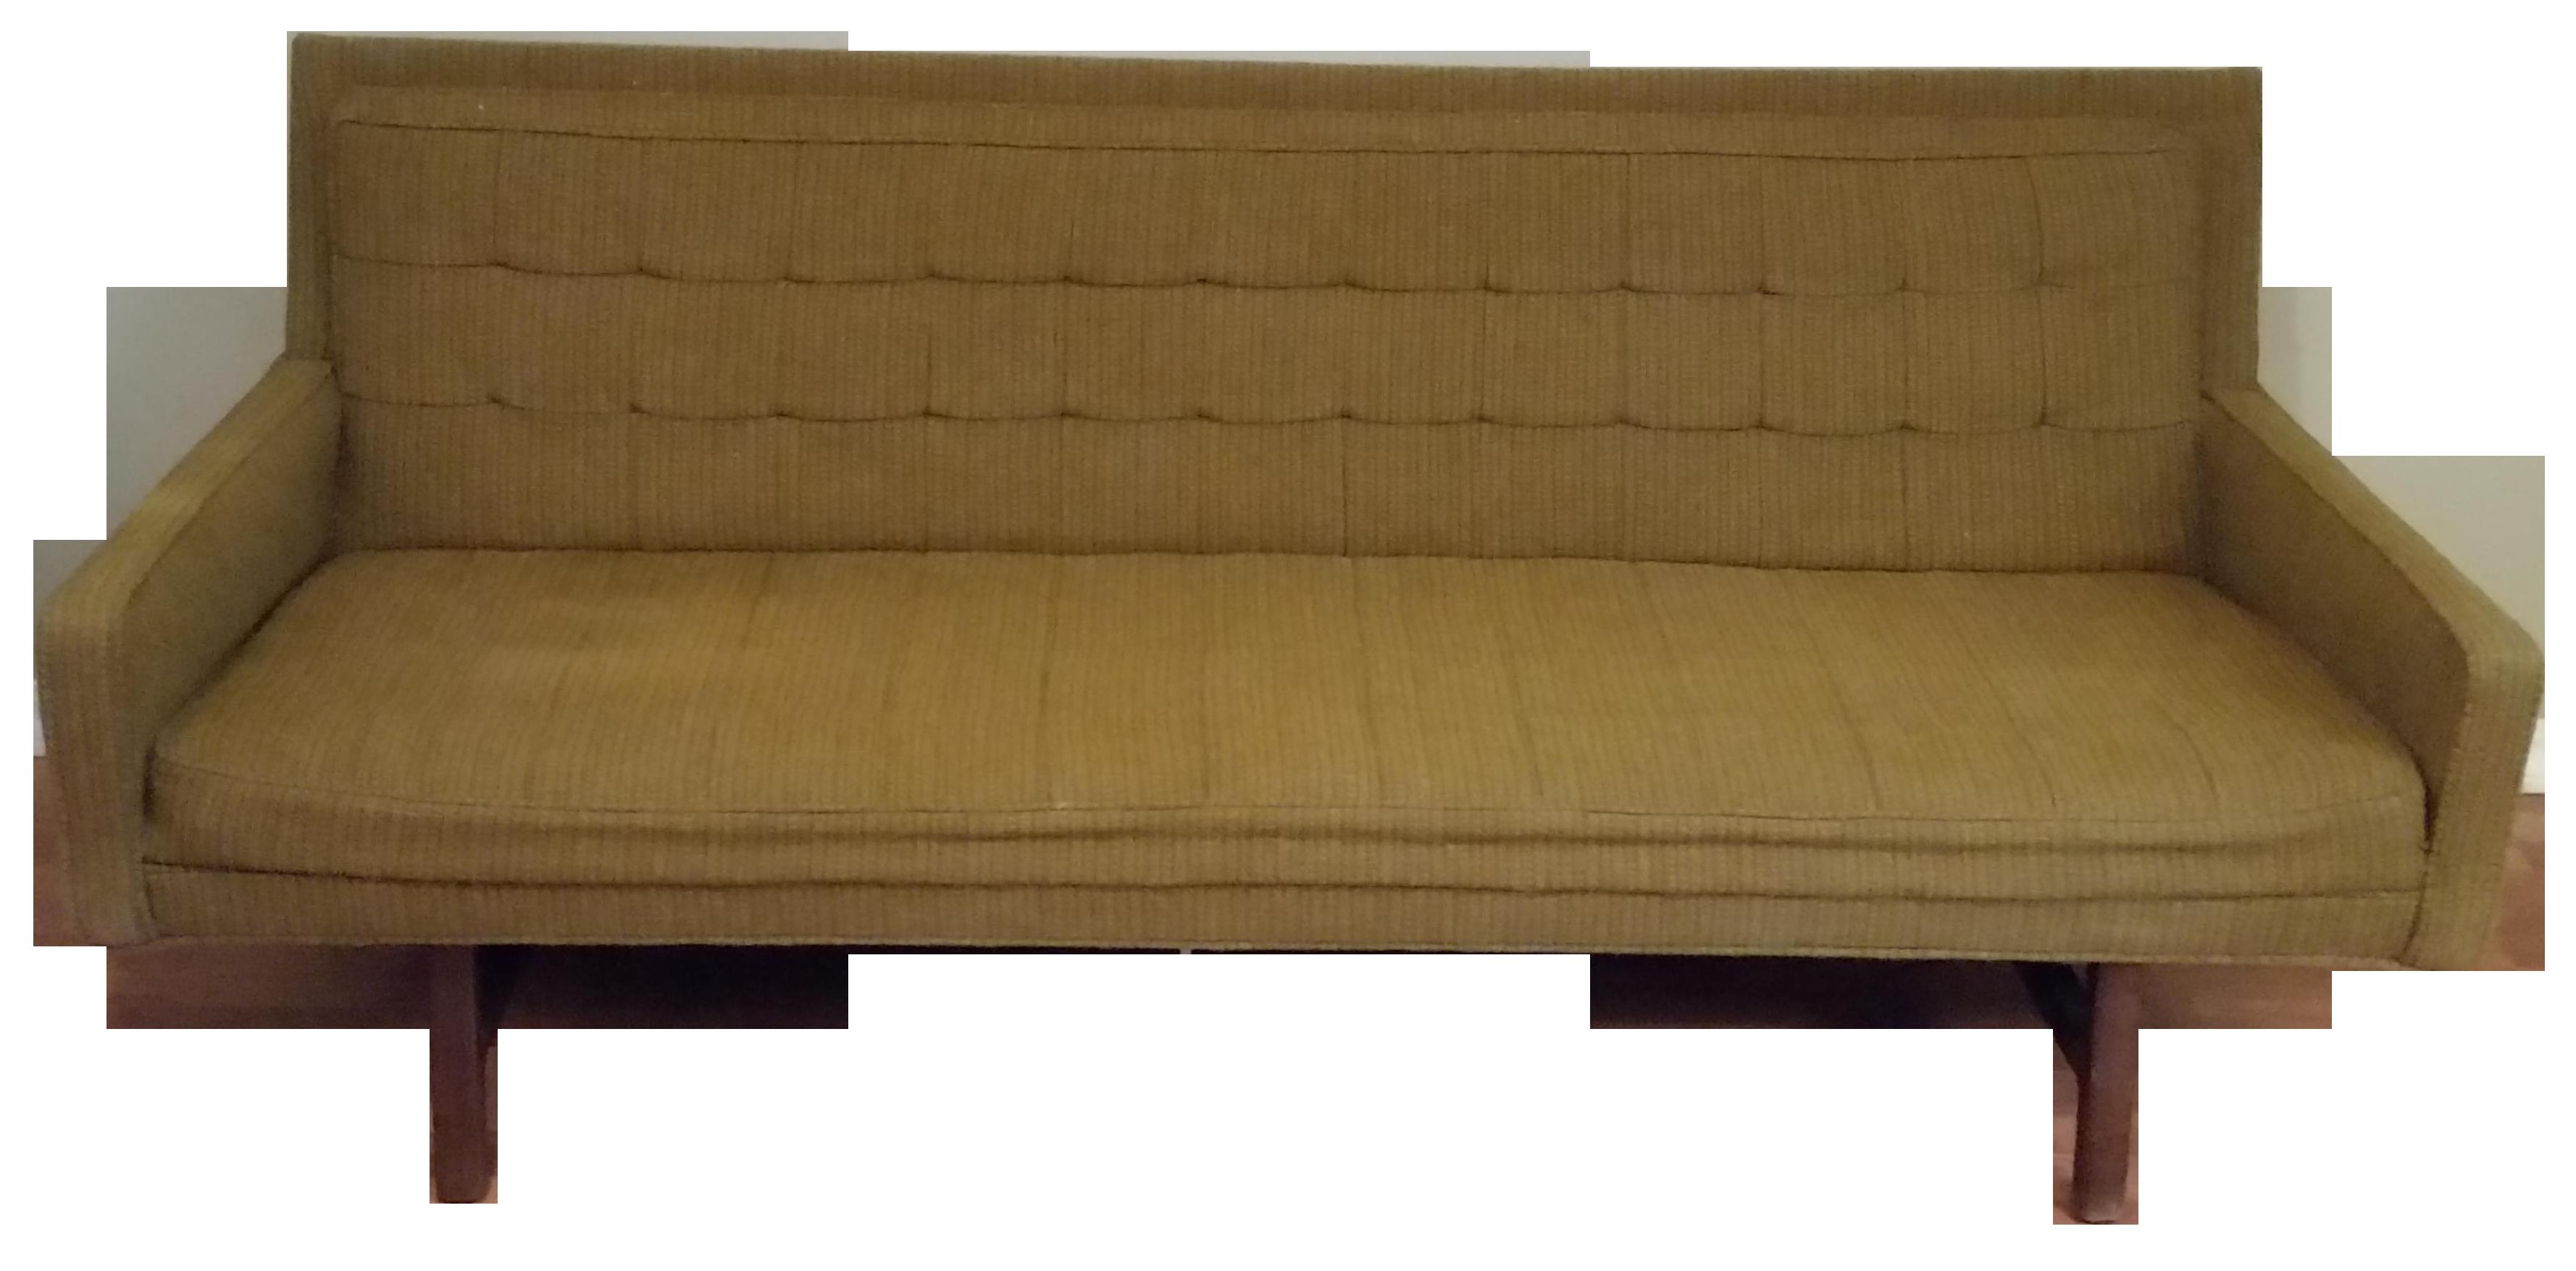 Milo Baughman 1969 Olive Green Sofa